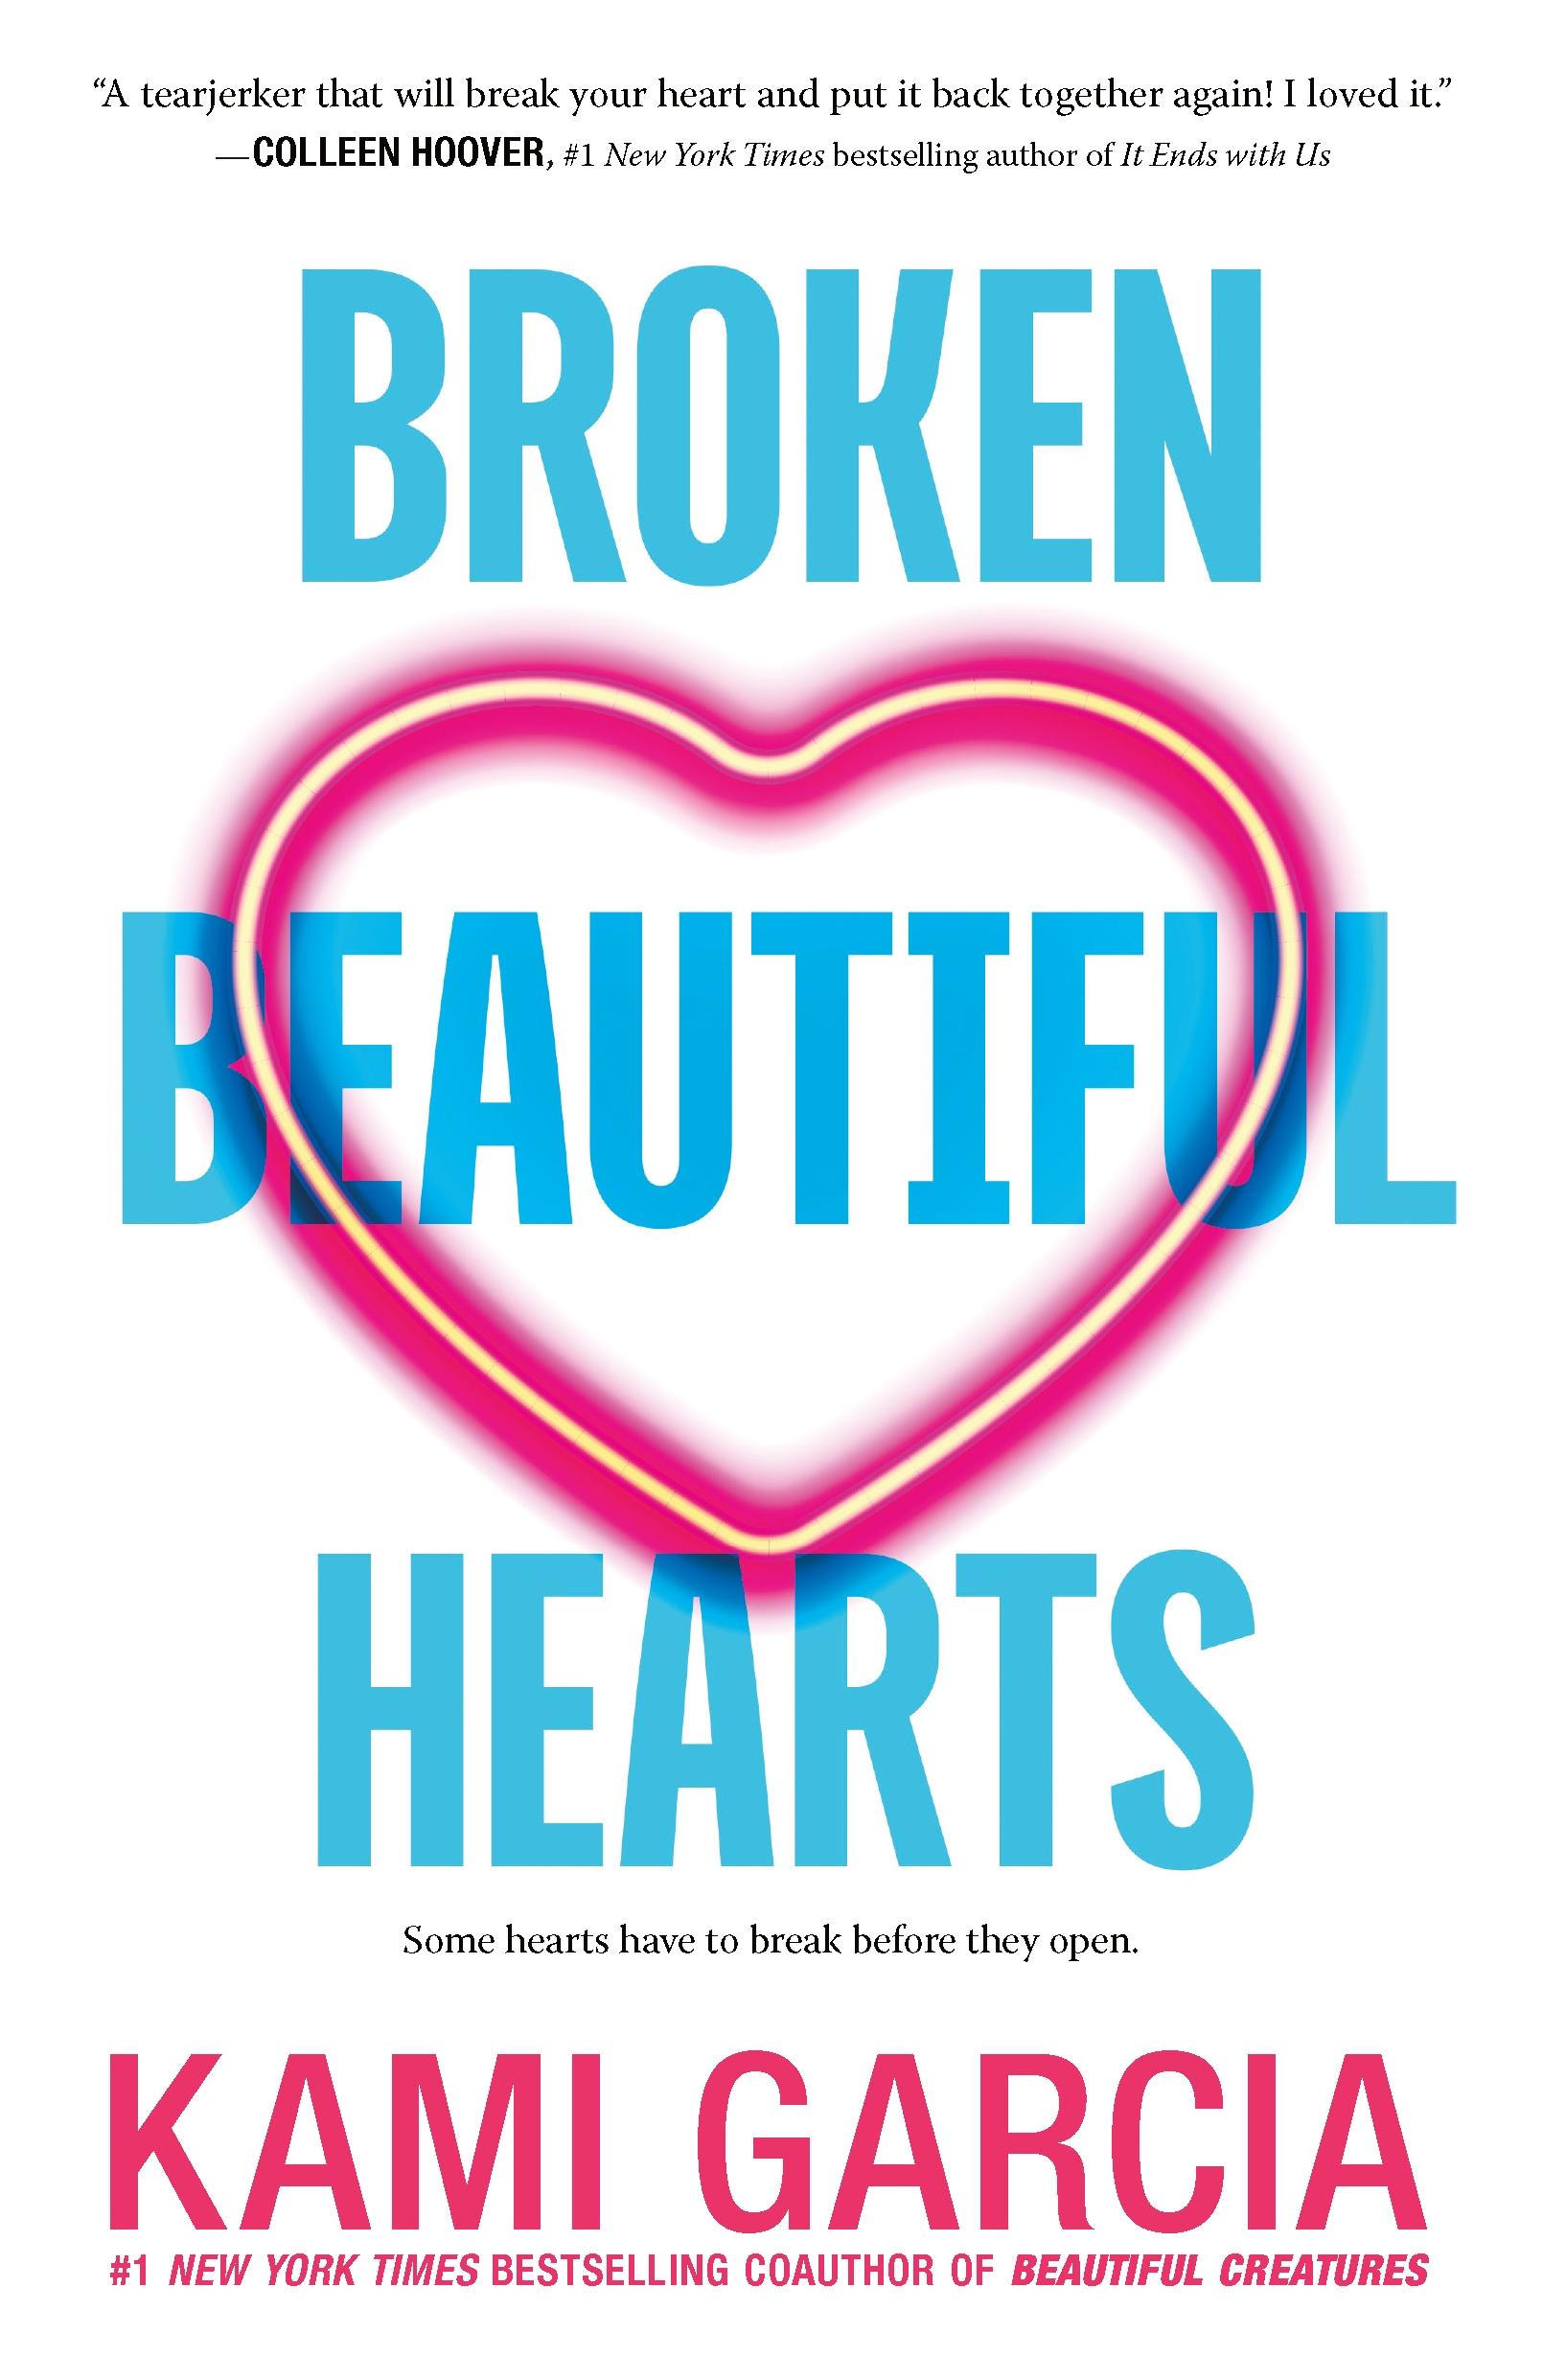 Broken beautiful hearts cover image